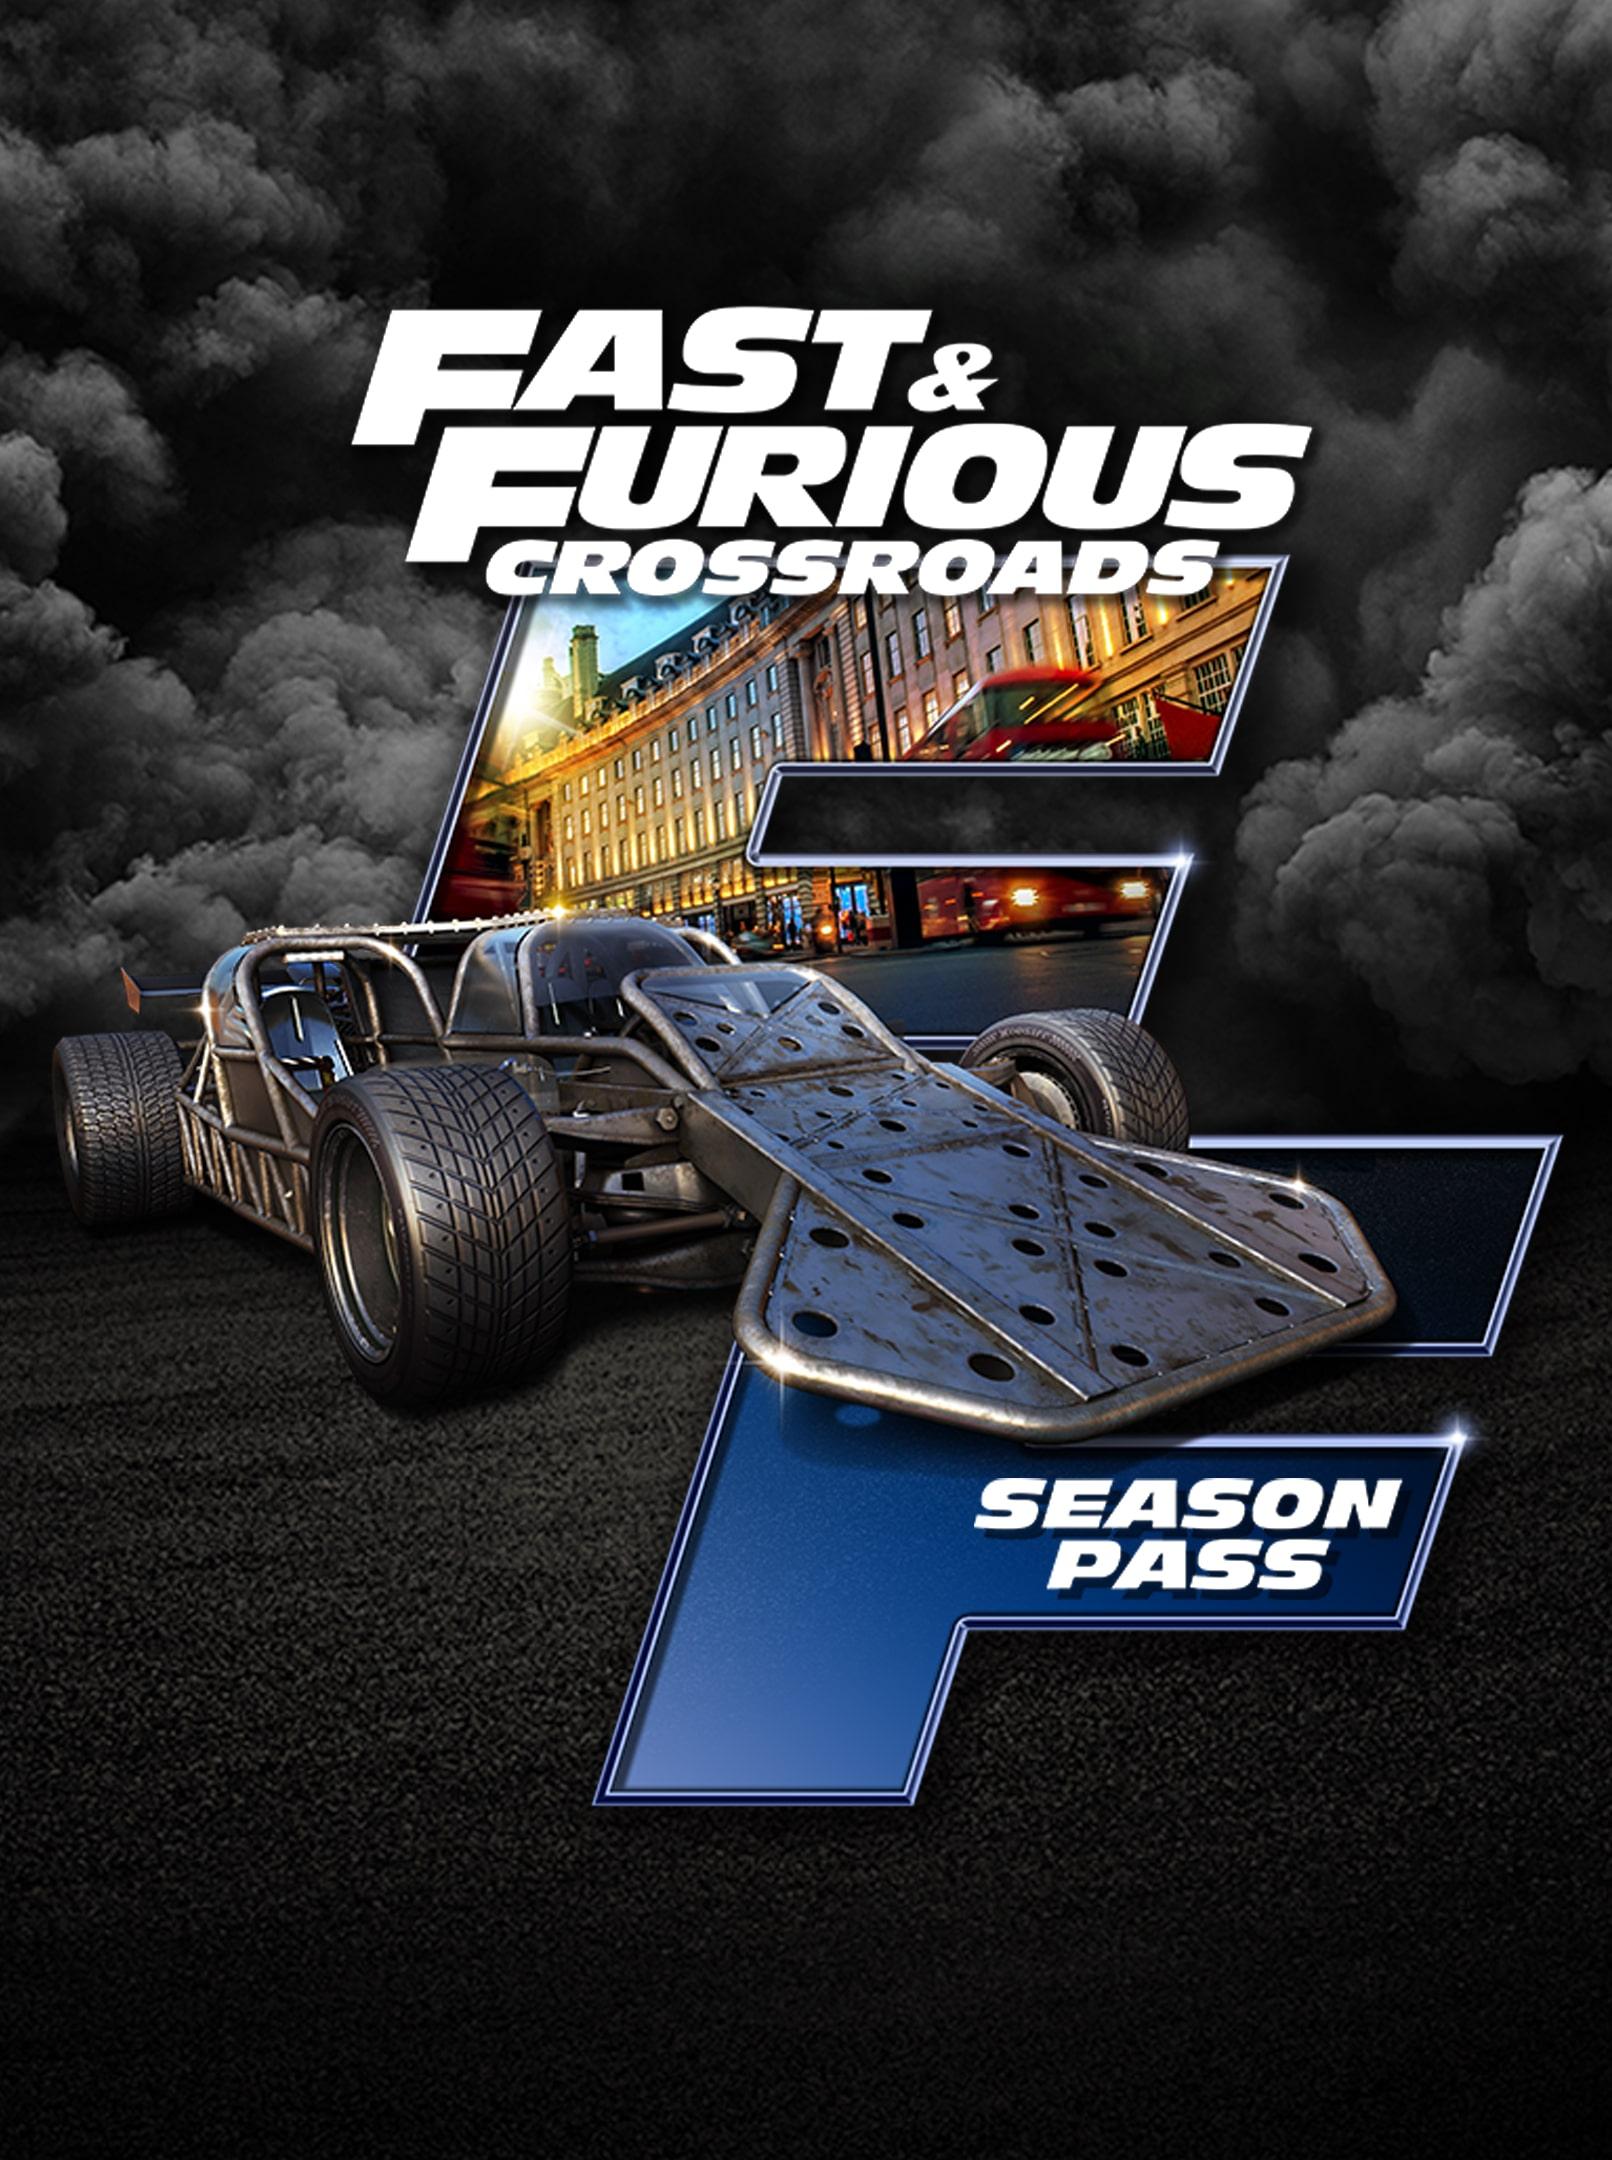 FAST & FURIOUS CROSSROADS: Season Pass (PC) steam